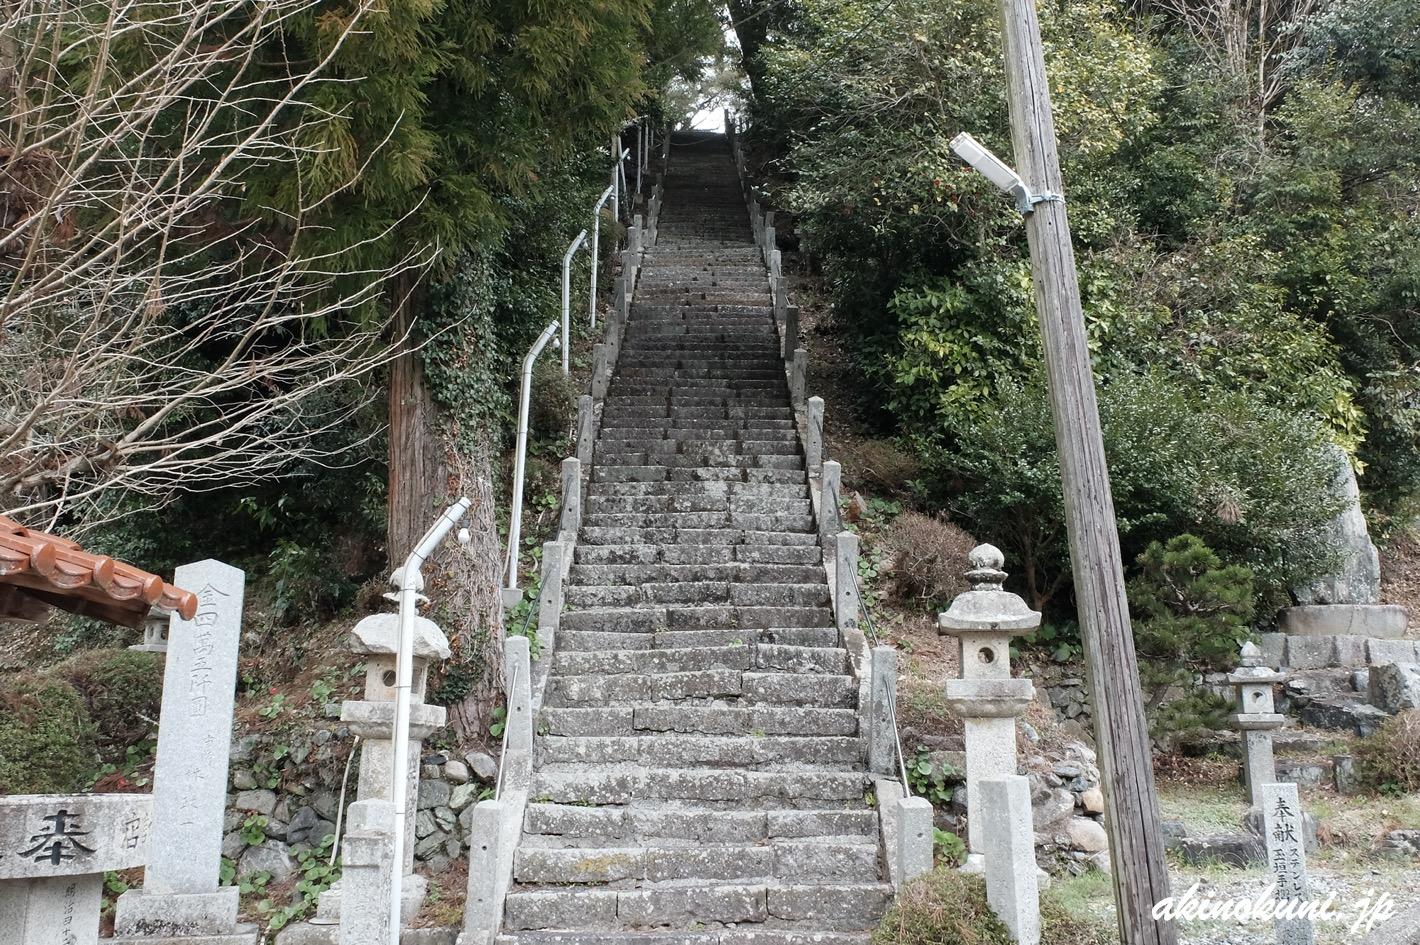 鮎原剣神社 急な階段